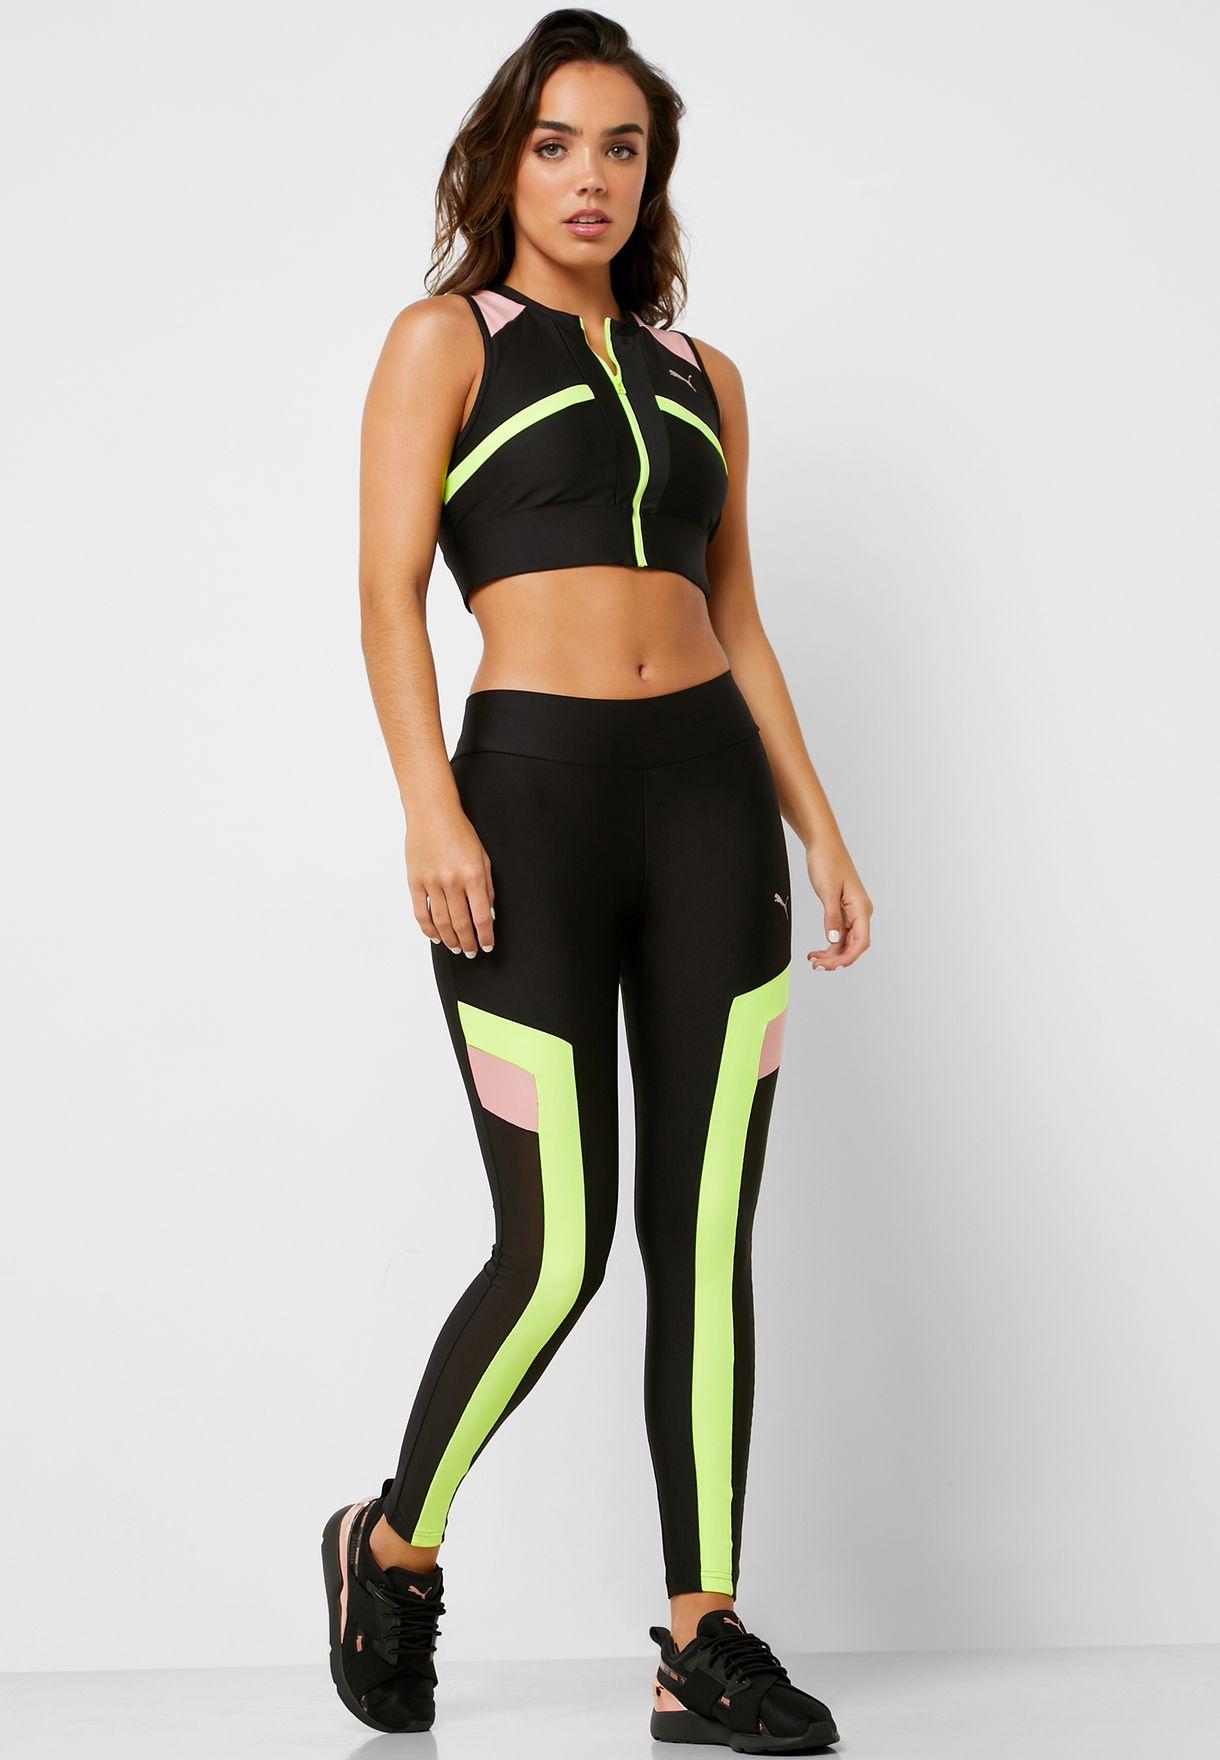 puma leggings and crop top \u003e Up to 65